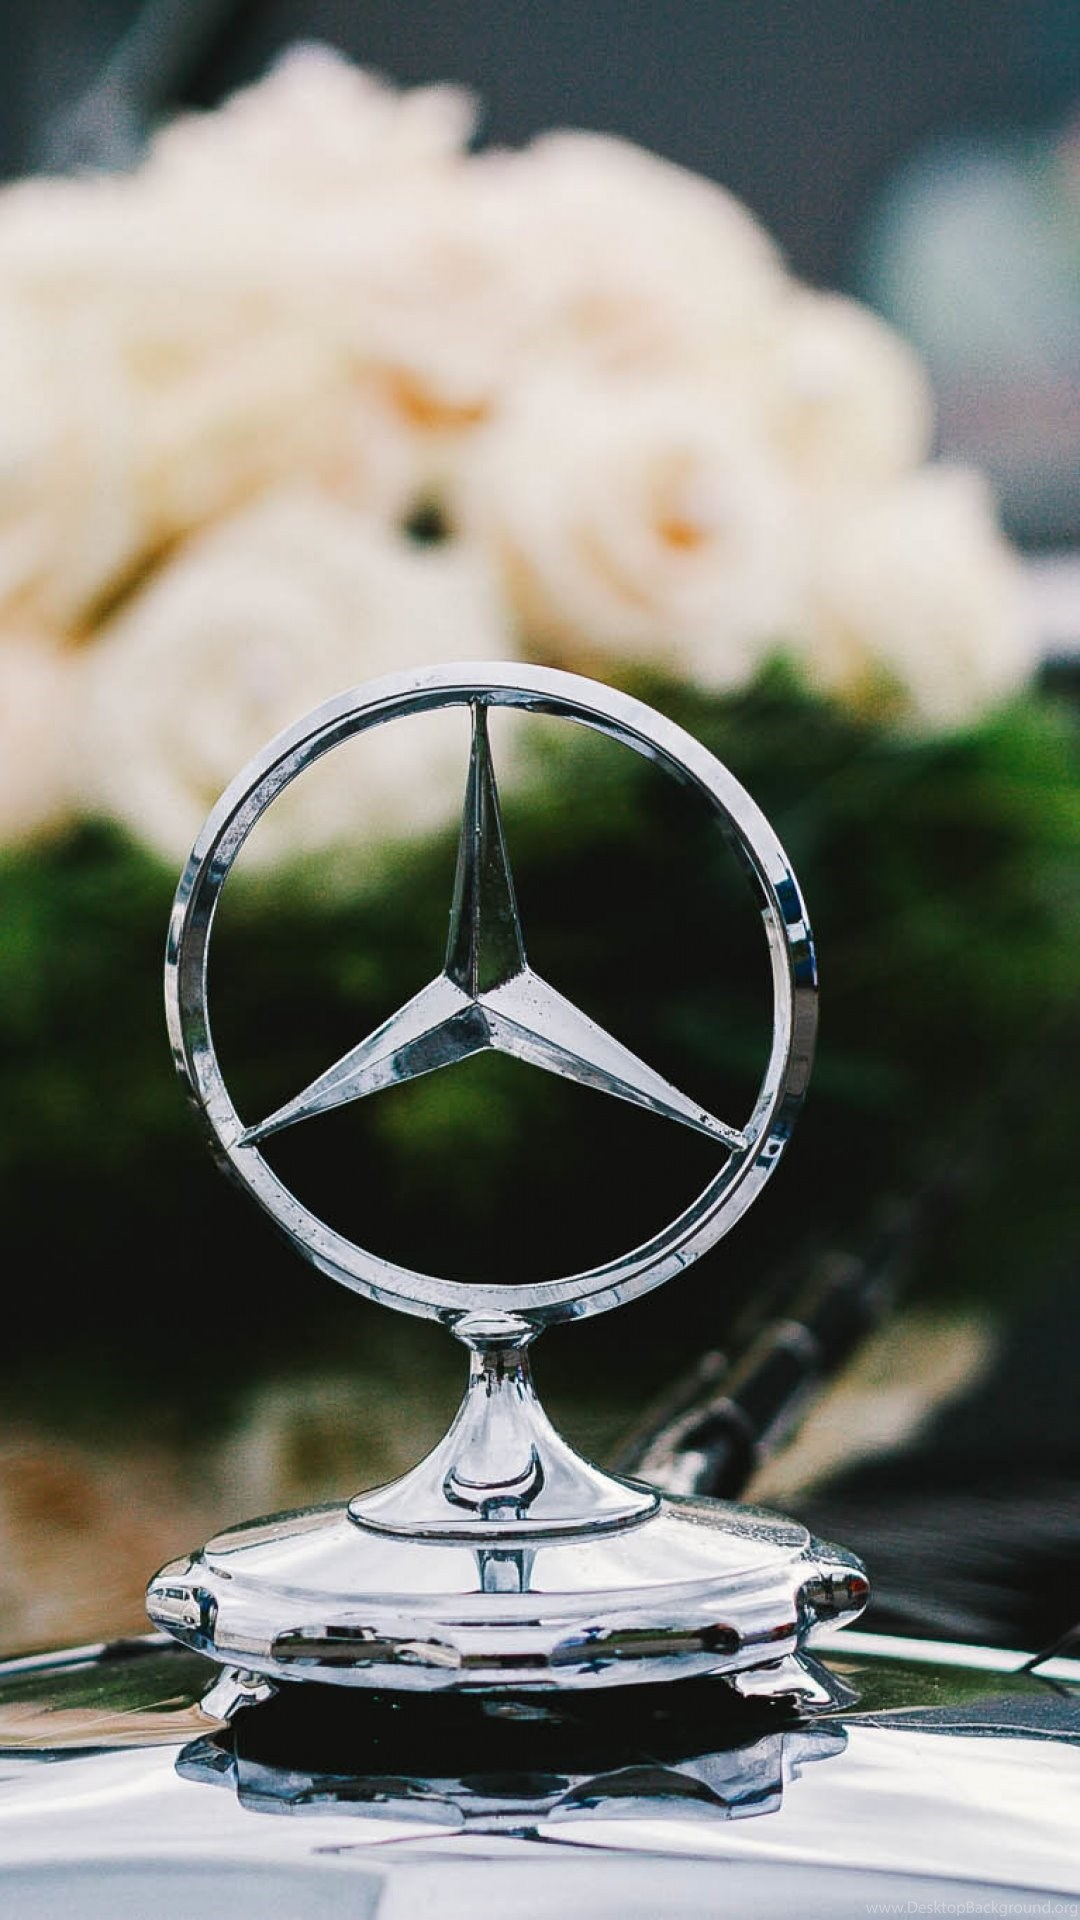 Hd Backgrounds Mercedes Benz Logo Badge Vintage Car Wallpapers